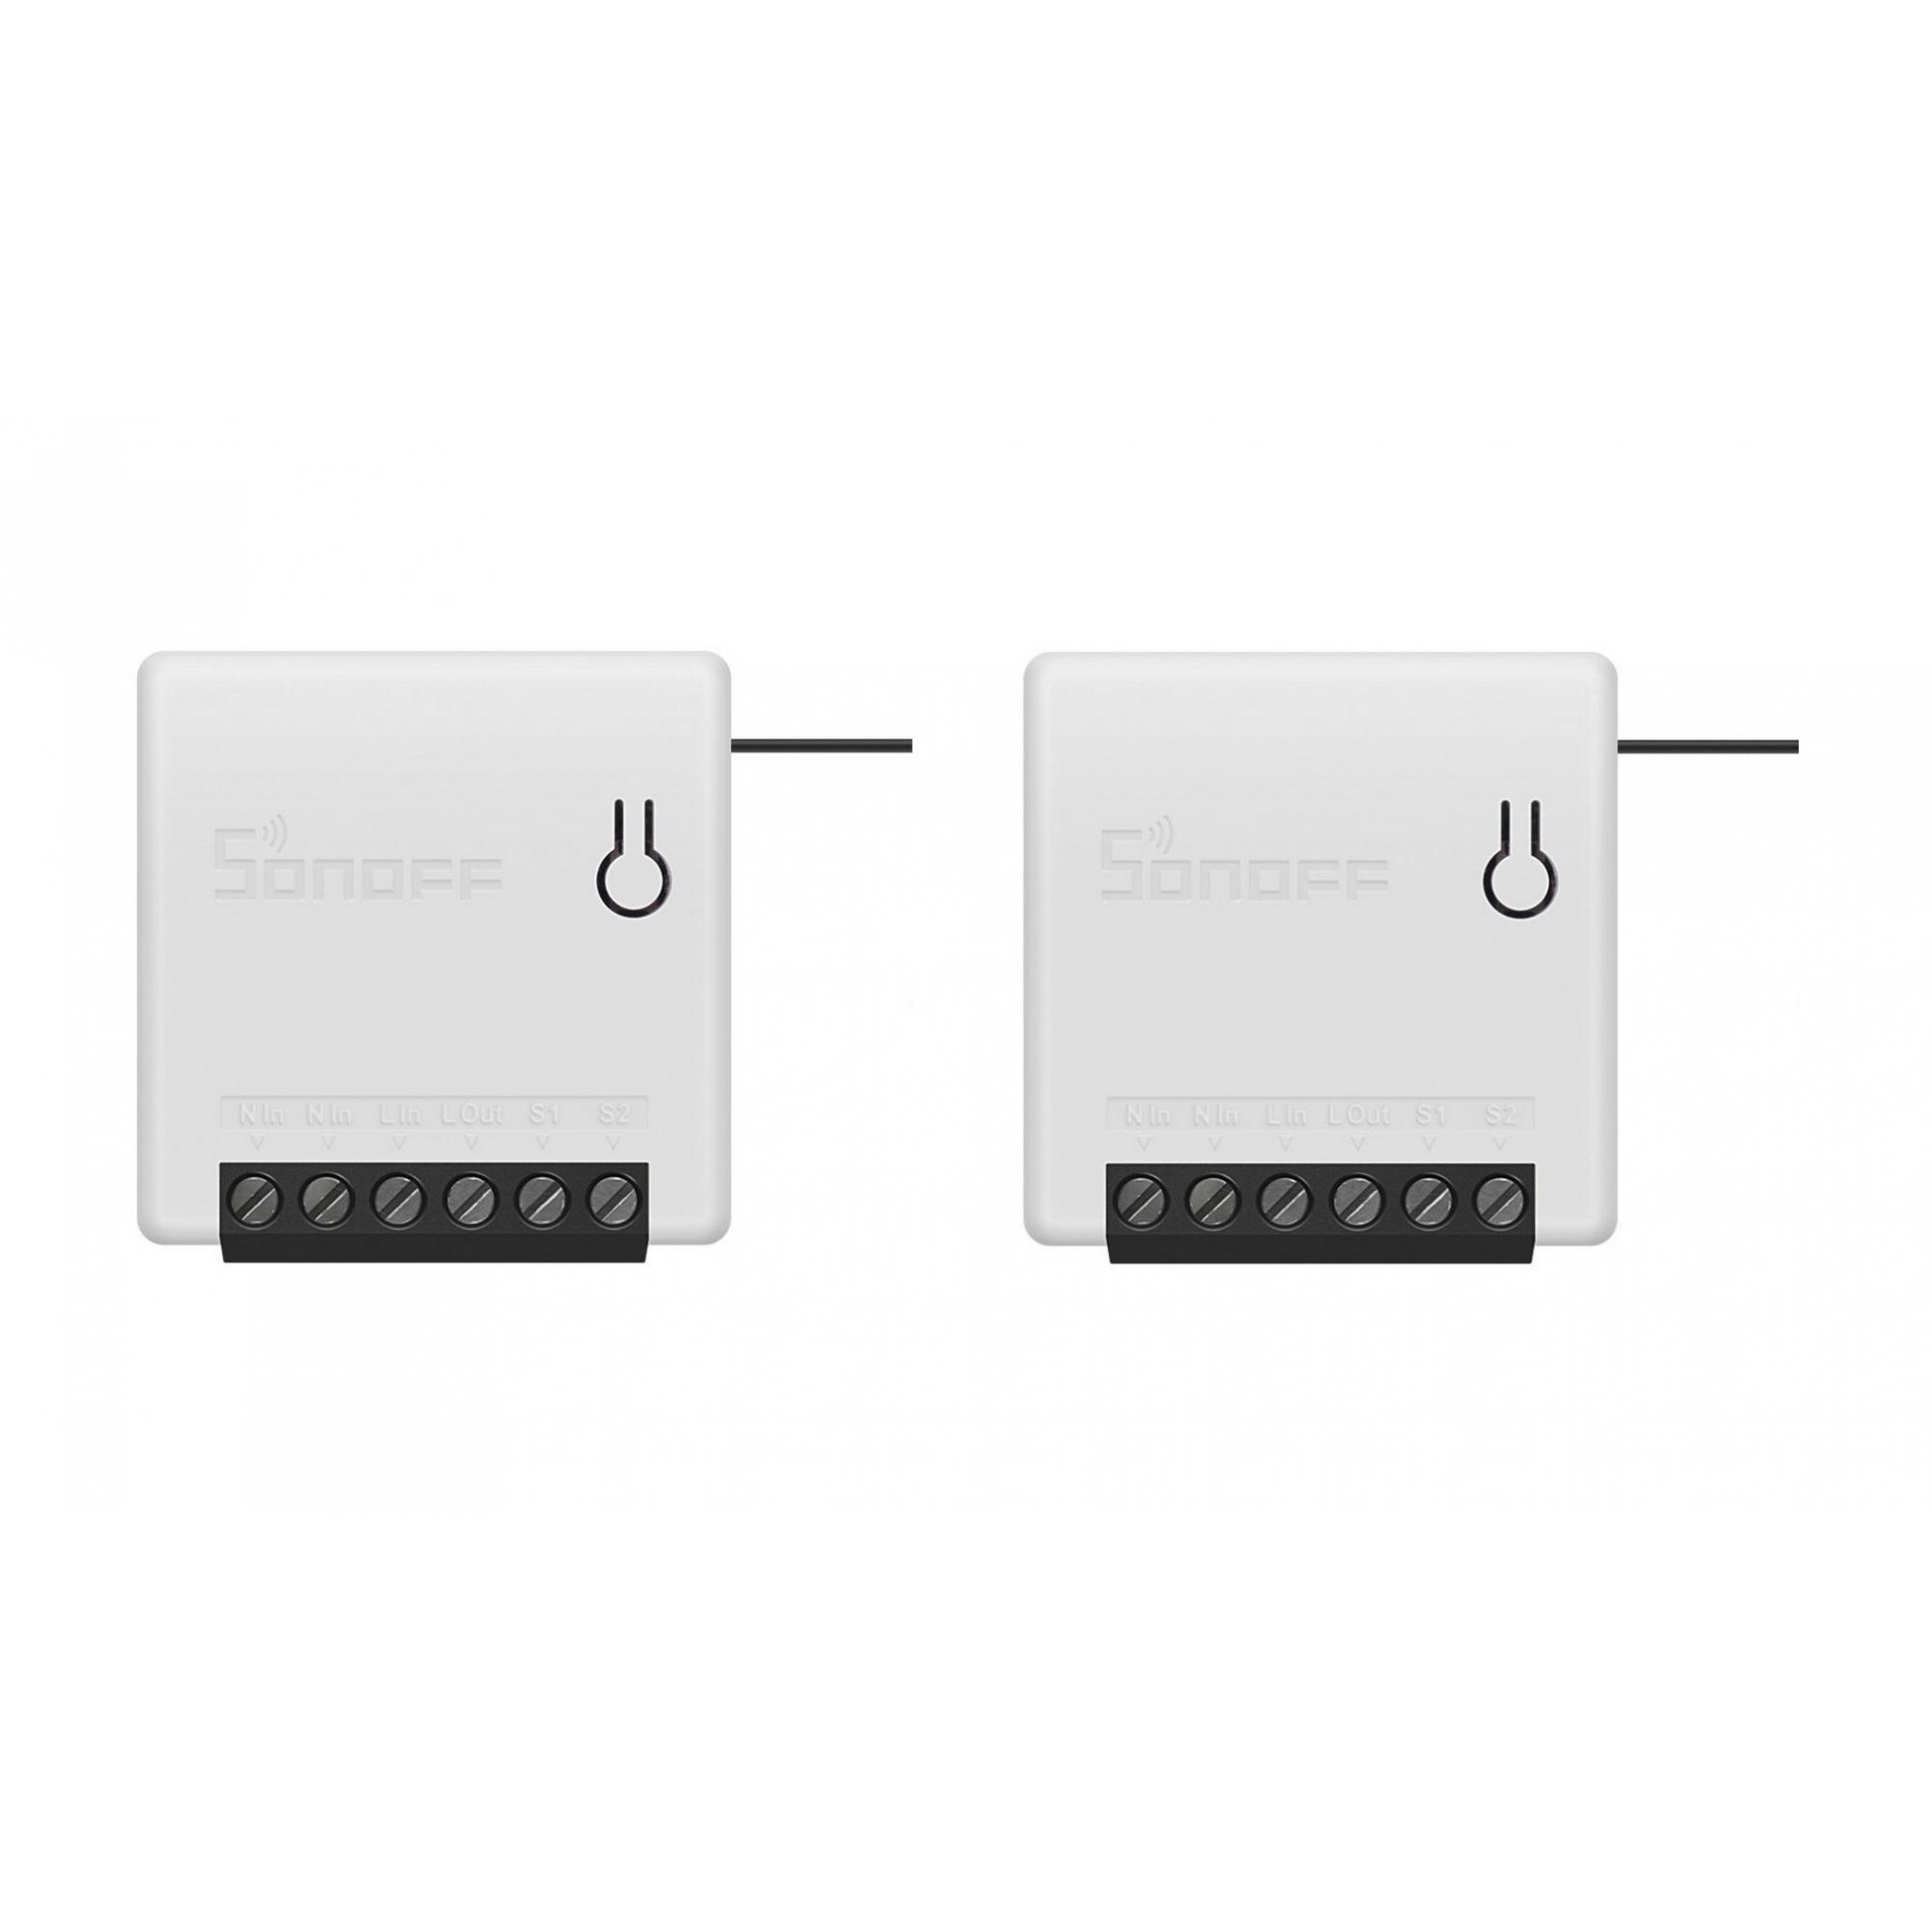 Kit 2 Sonoff Mini Smart Switch 1 Canal